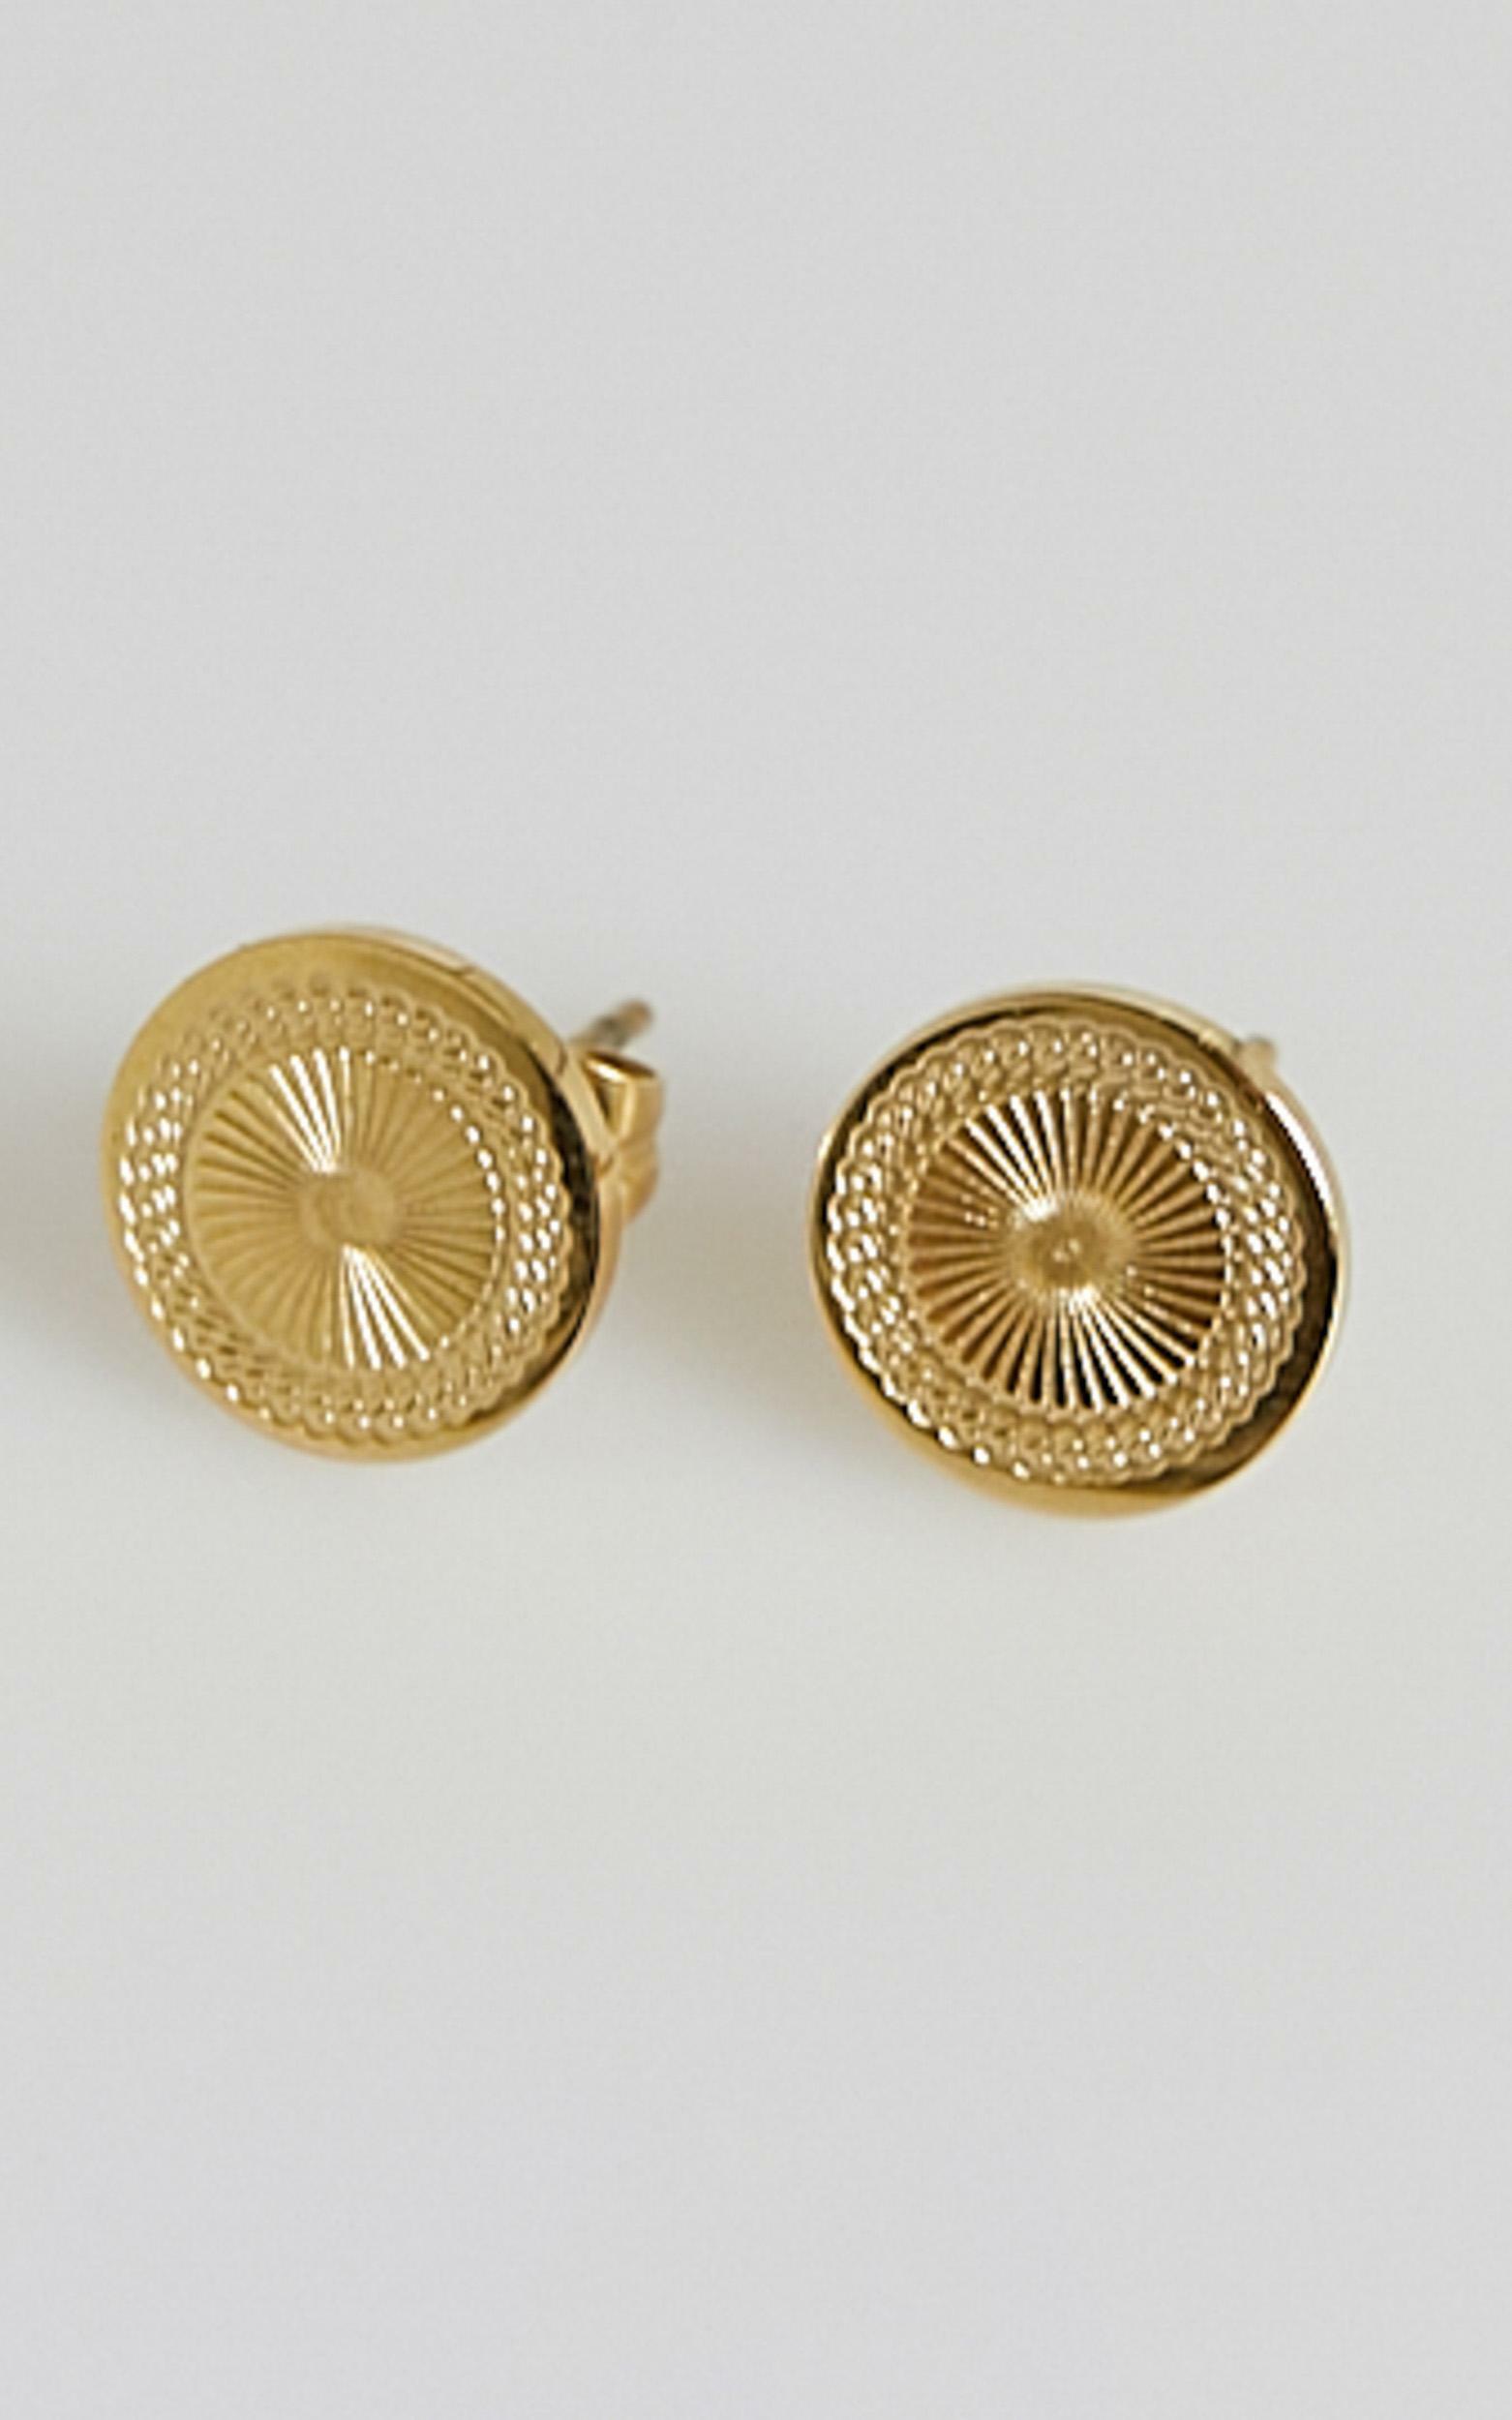 Peta and Jain - Aurora Earrings in Gold, GLD1, hi-res image number null